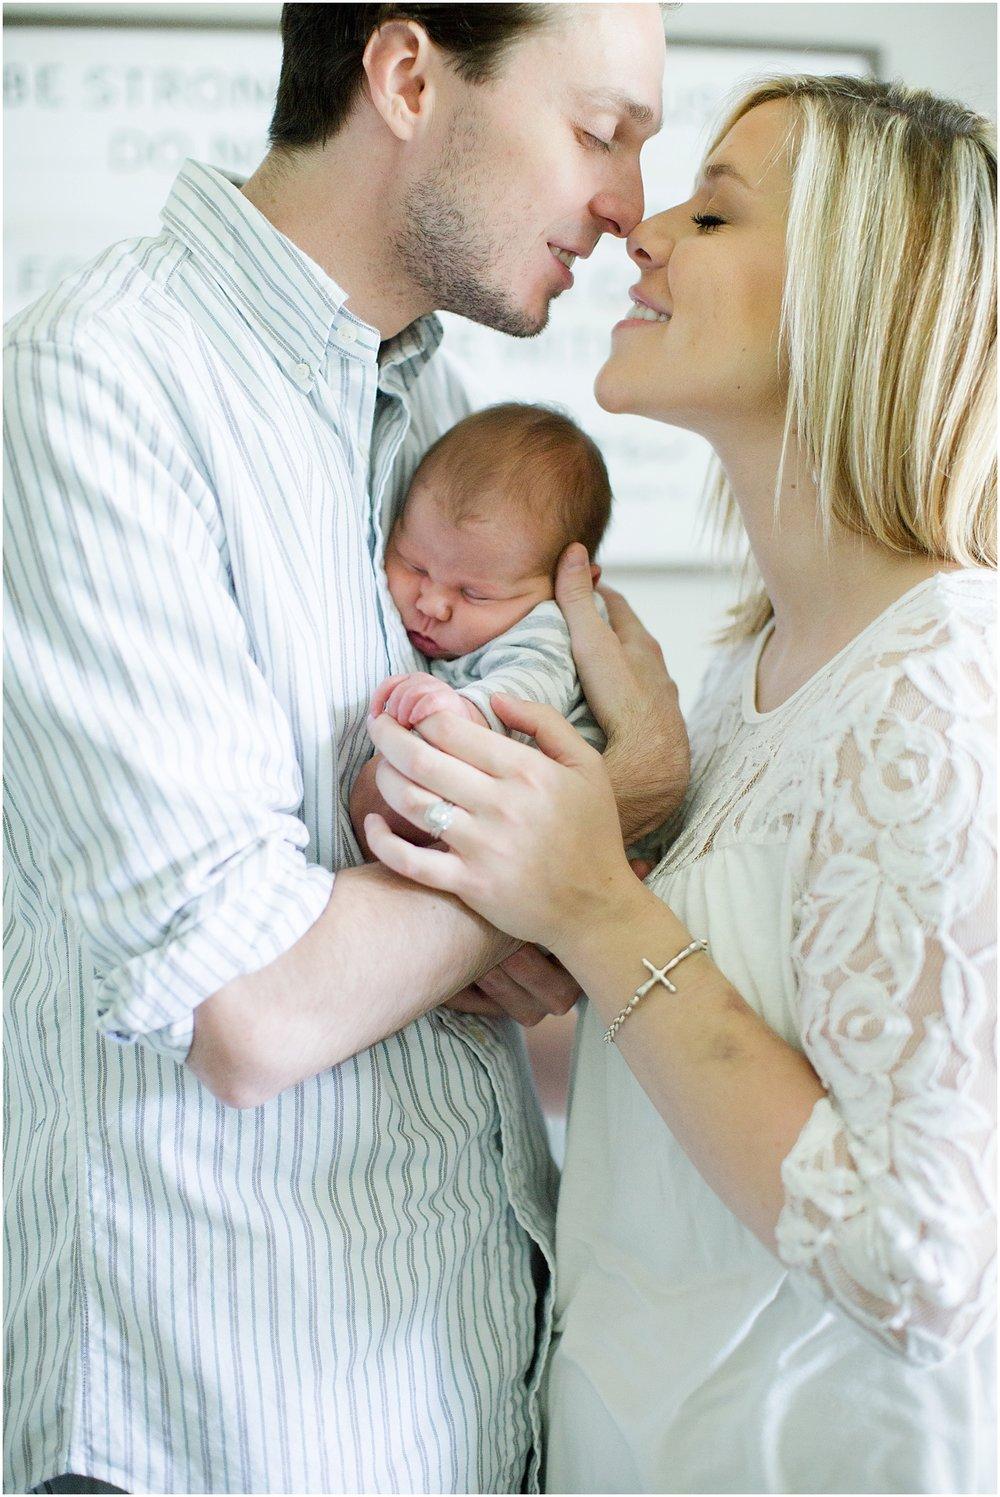 Ashley Powell Photography Grayson Newborn Session_0028.jpg